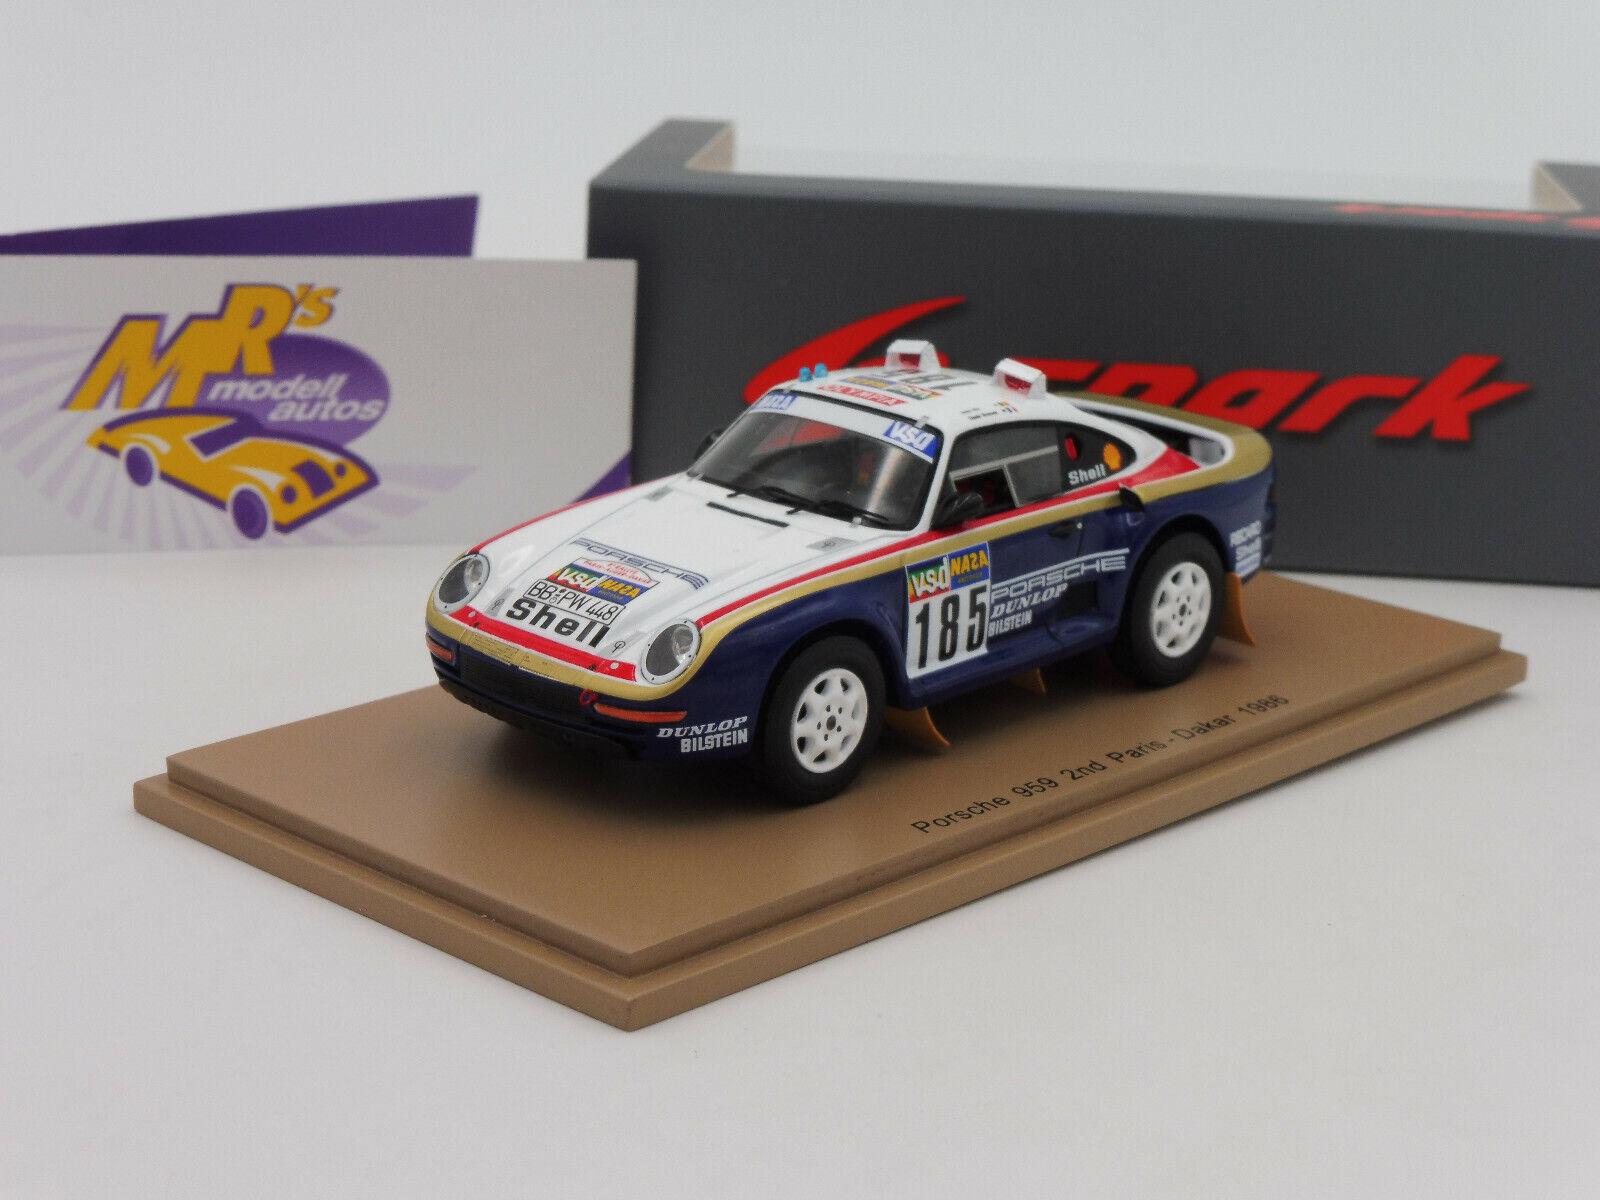 Spark s7814 Porsche 959 nº 185 2nd Place  paris-dakar 1986  1 43 nuevo